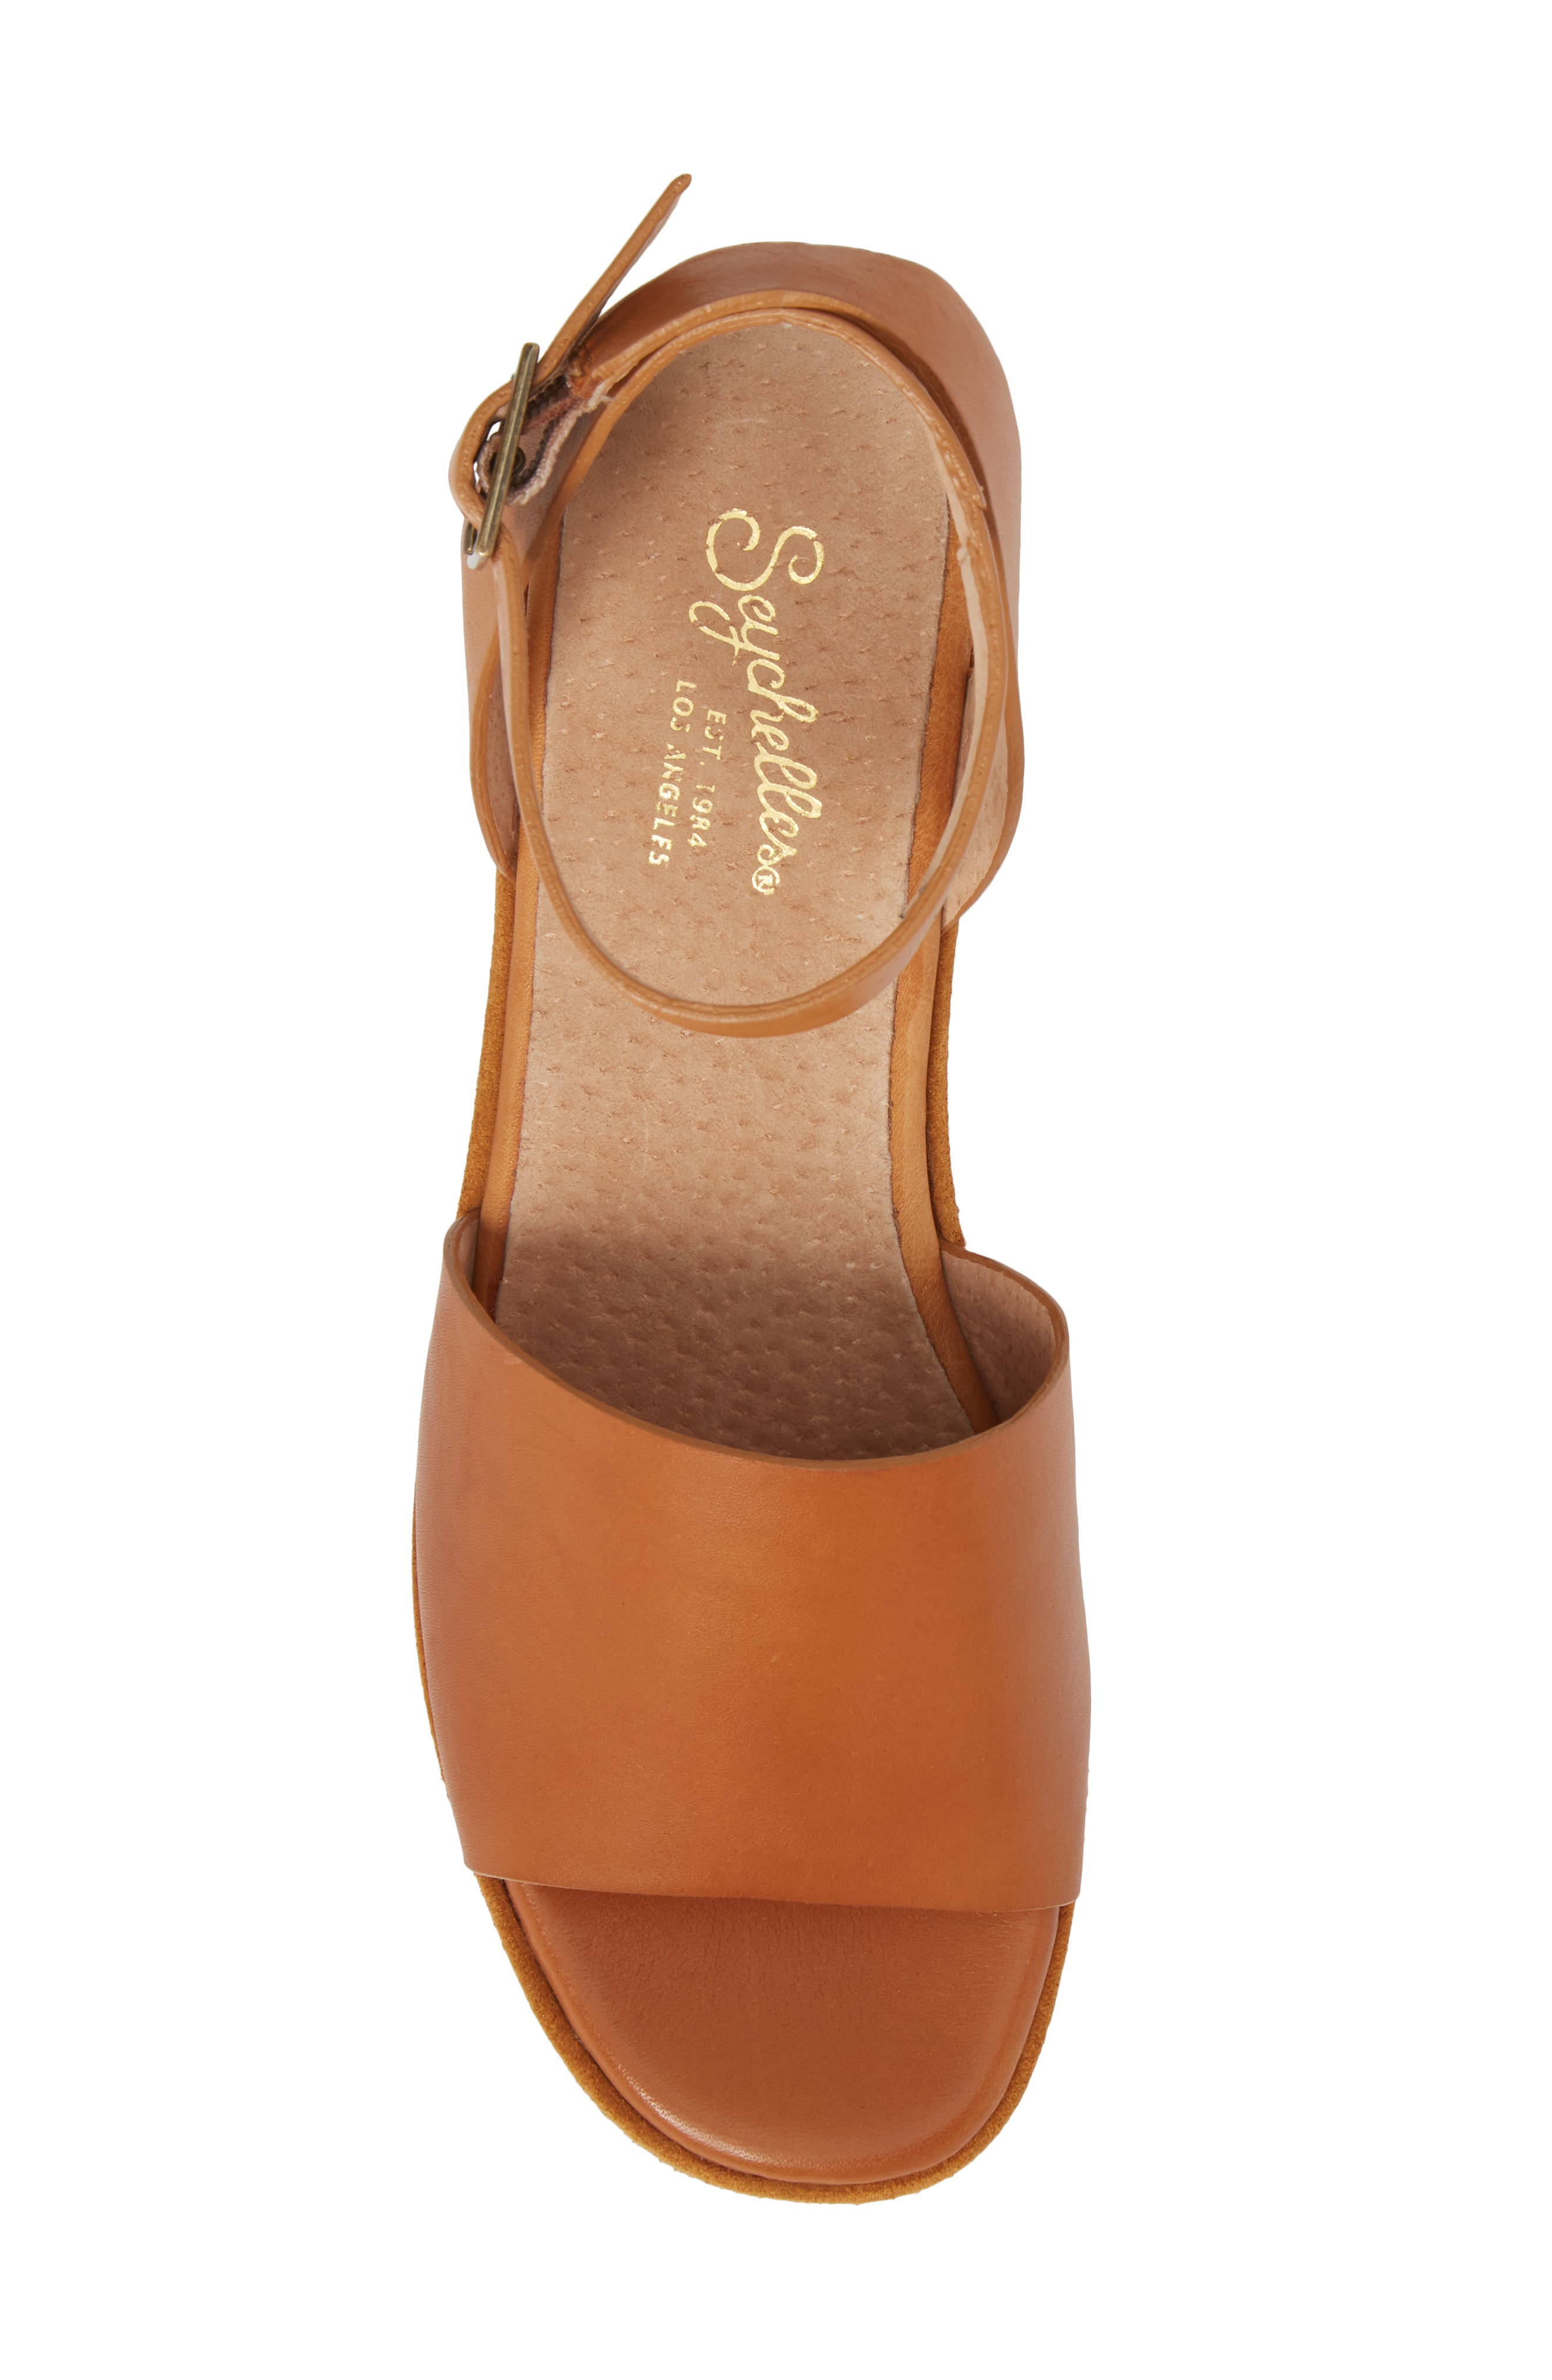 Calming Influence Platform Sandal,                             Alternate thumbnail 5, color,                             Tan Leather